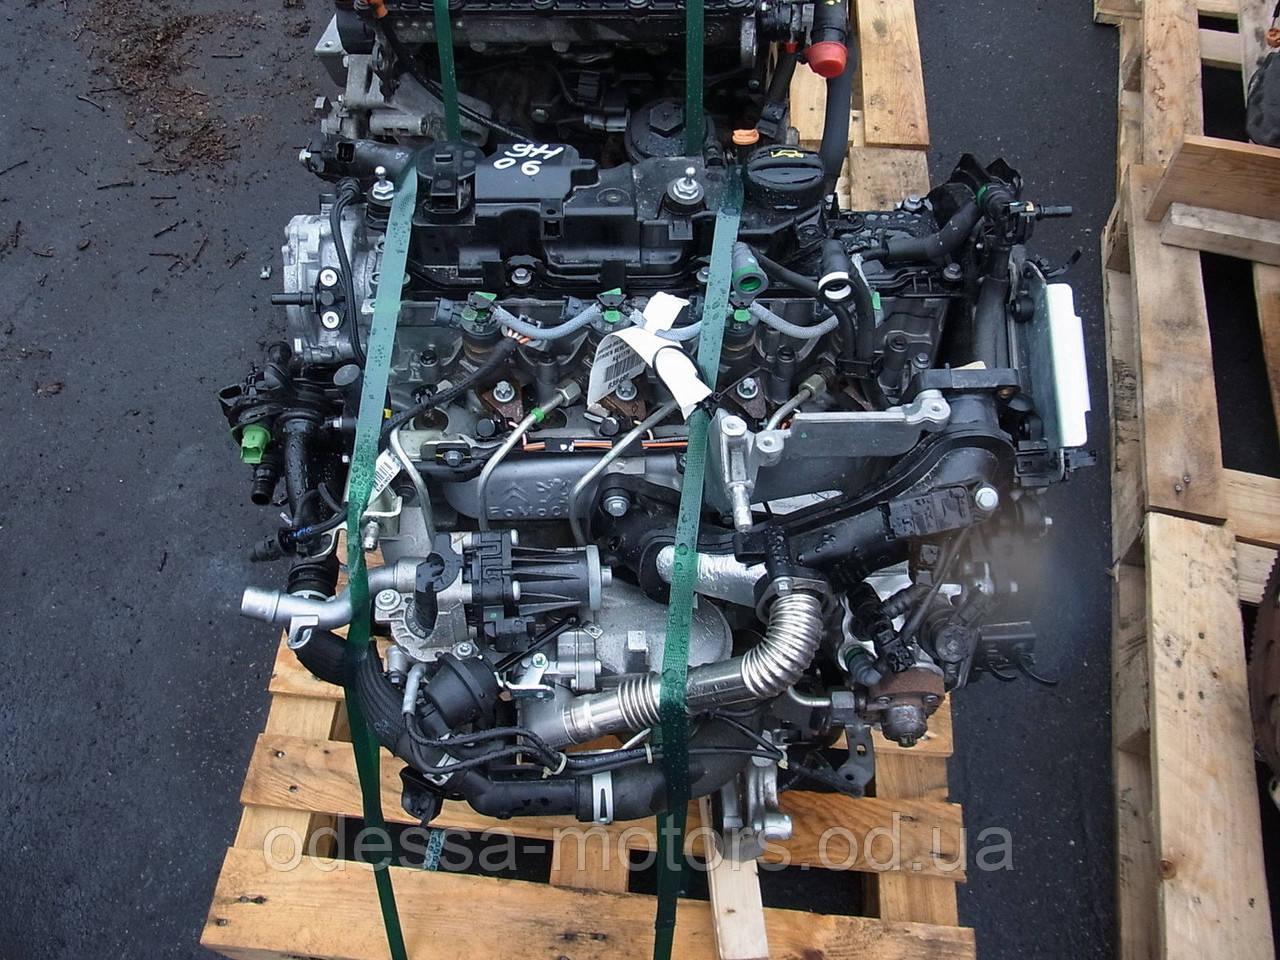 Двигатель Citroën Xsara Picasso 1.6 HDi, 2005-today тип мотора 9HX (DV6ATED4), фото 1